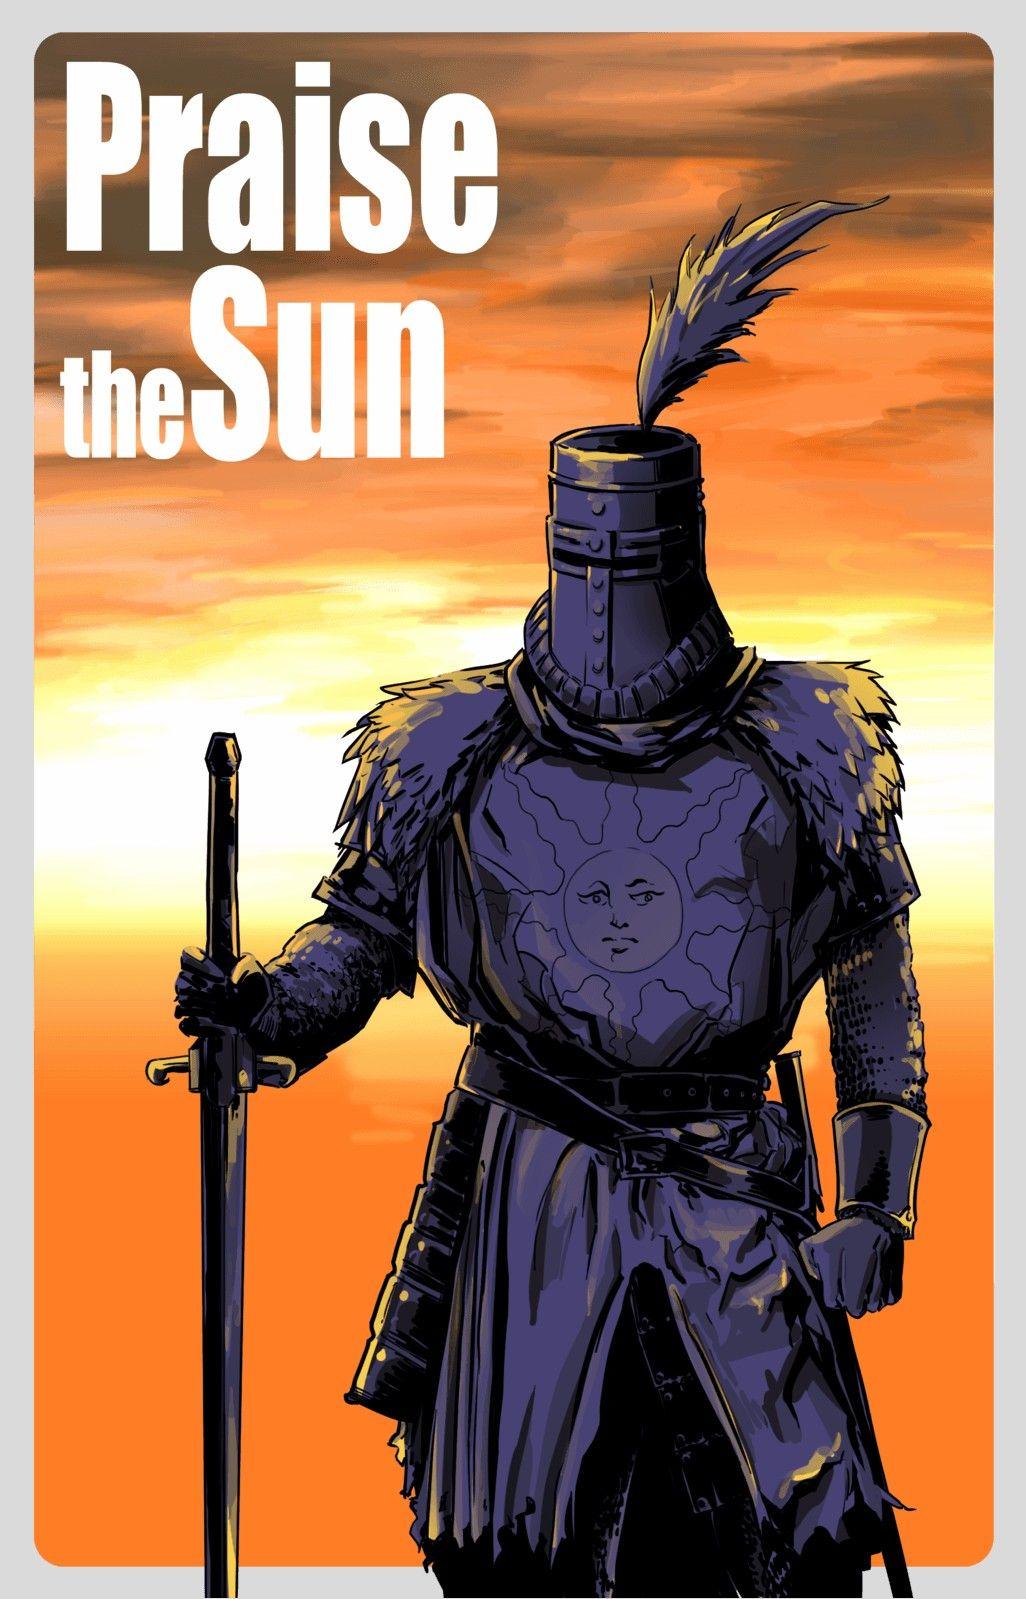 4k Dark Souls Solair Wallpaper In 2020 Dark Souls Dark Souls Solaire Dark Souls 2